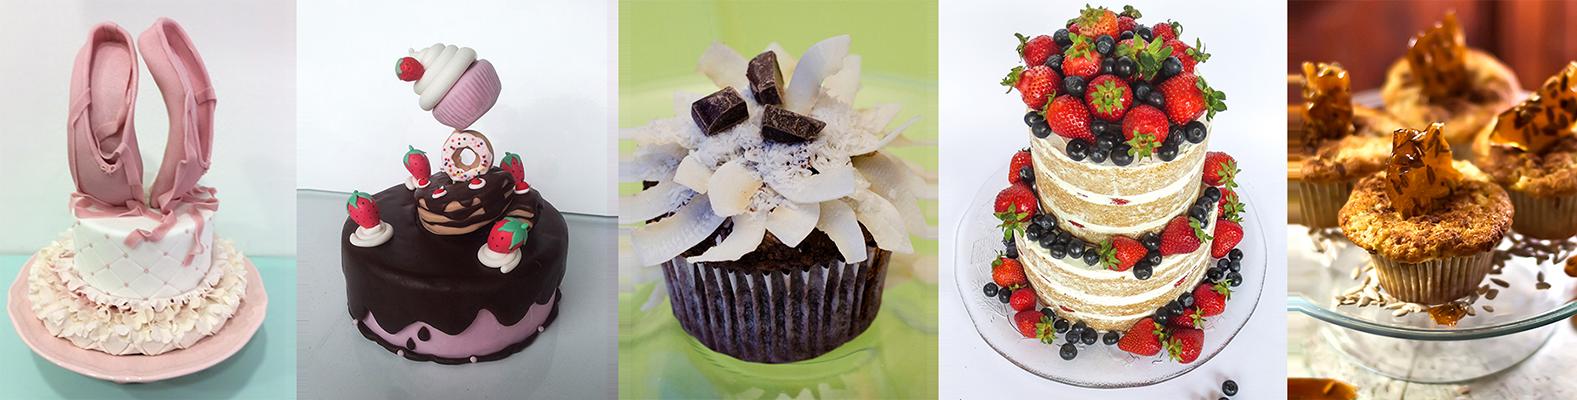 Cake Design Milano - varie torte realizzate da Muffinworld